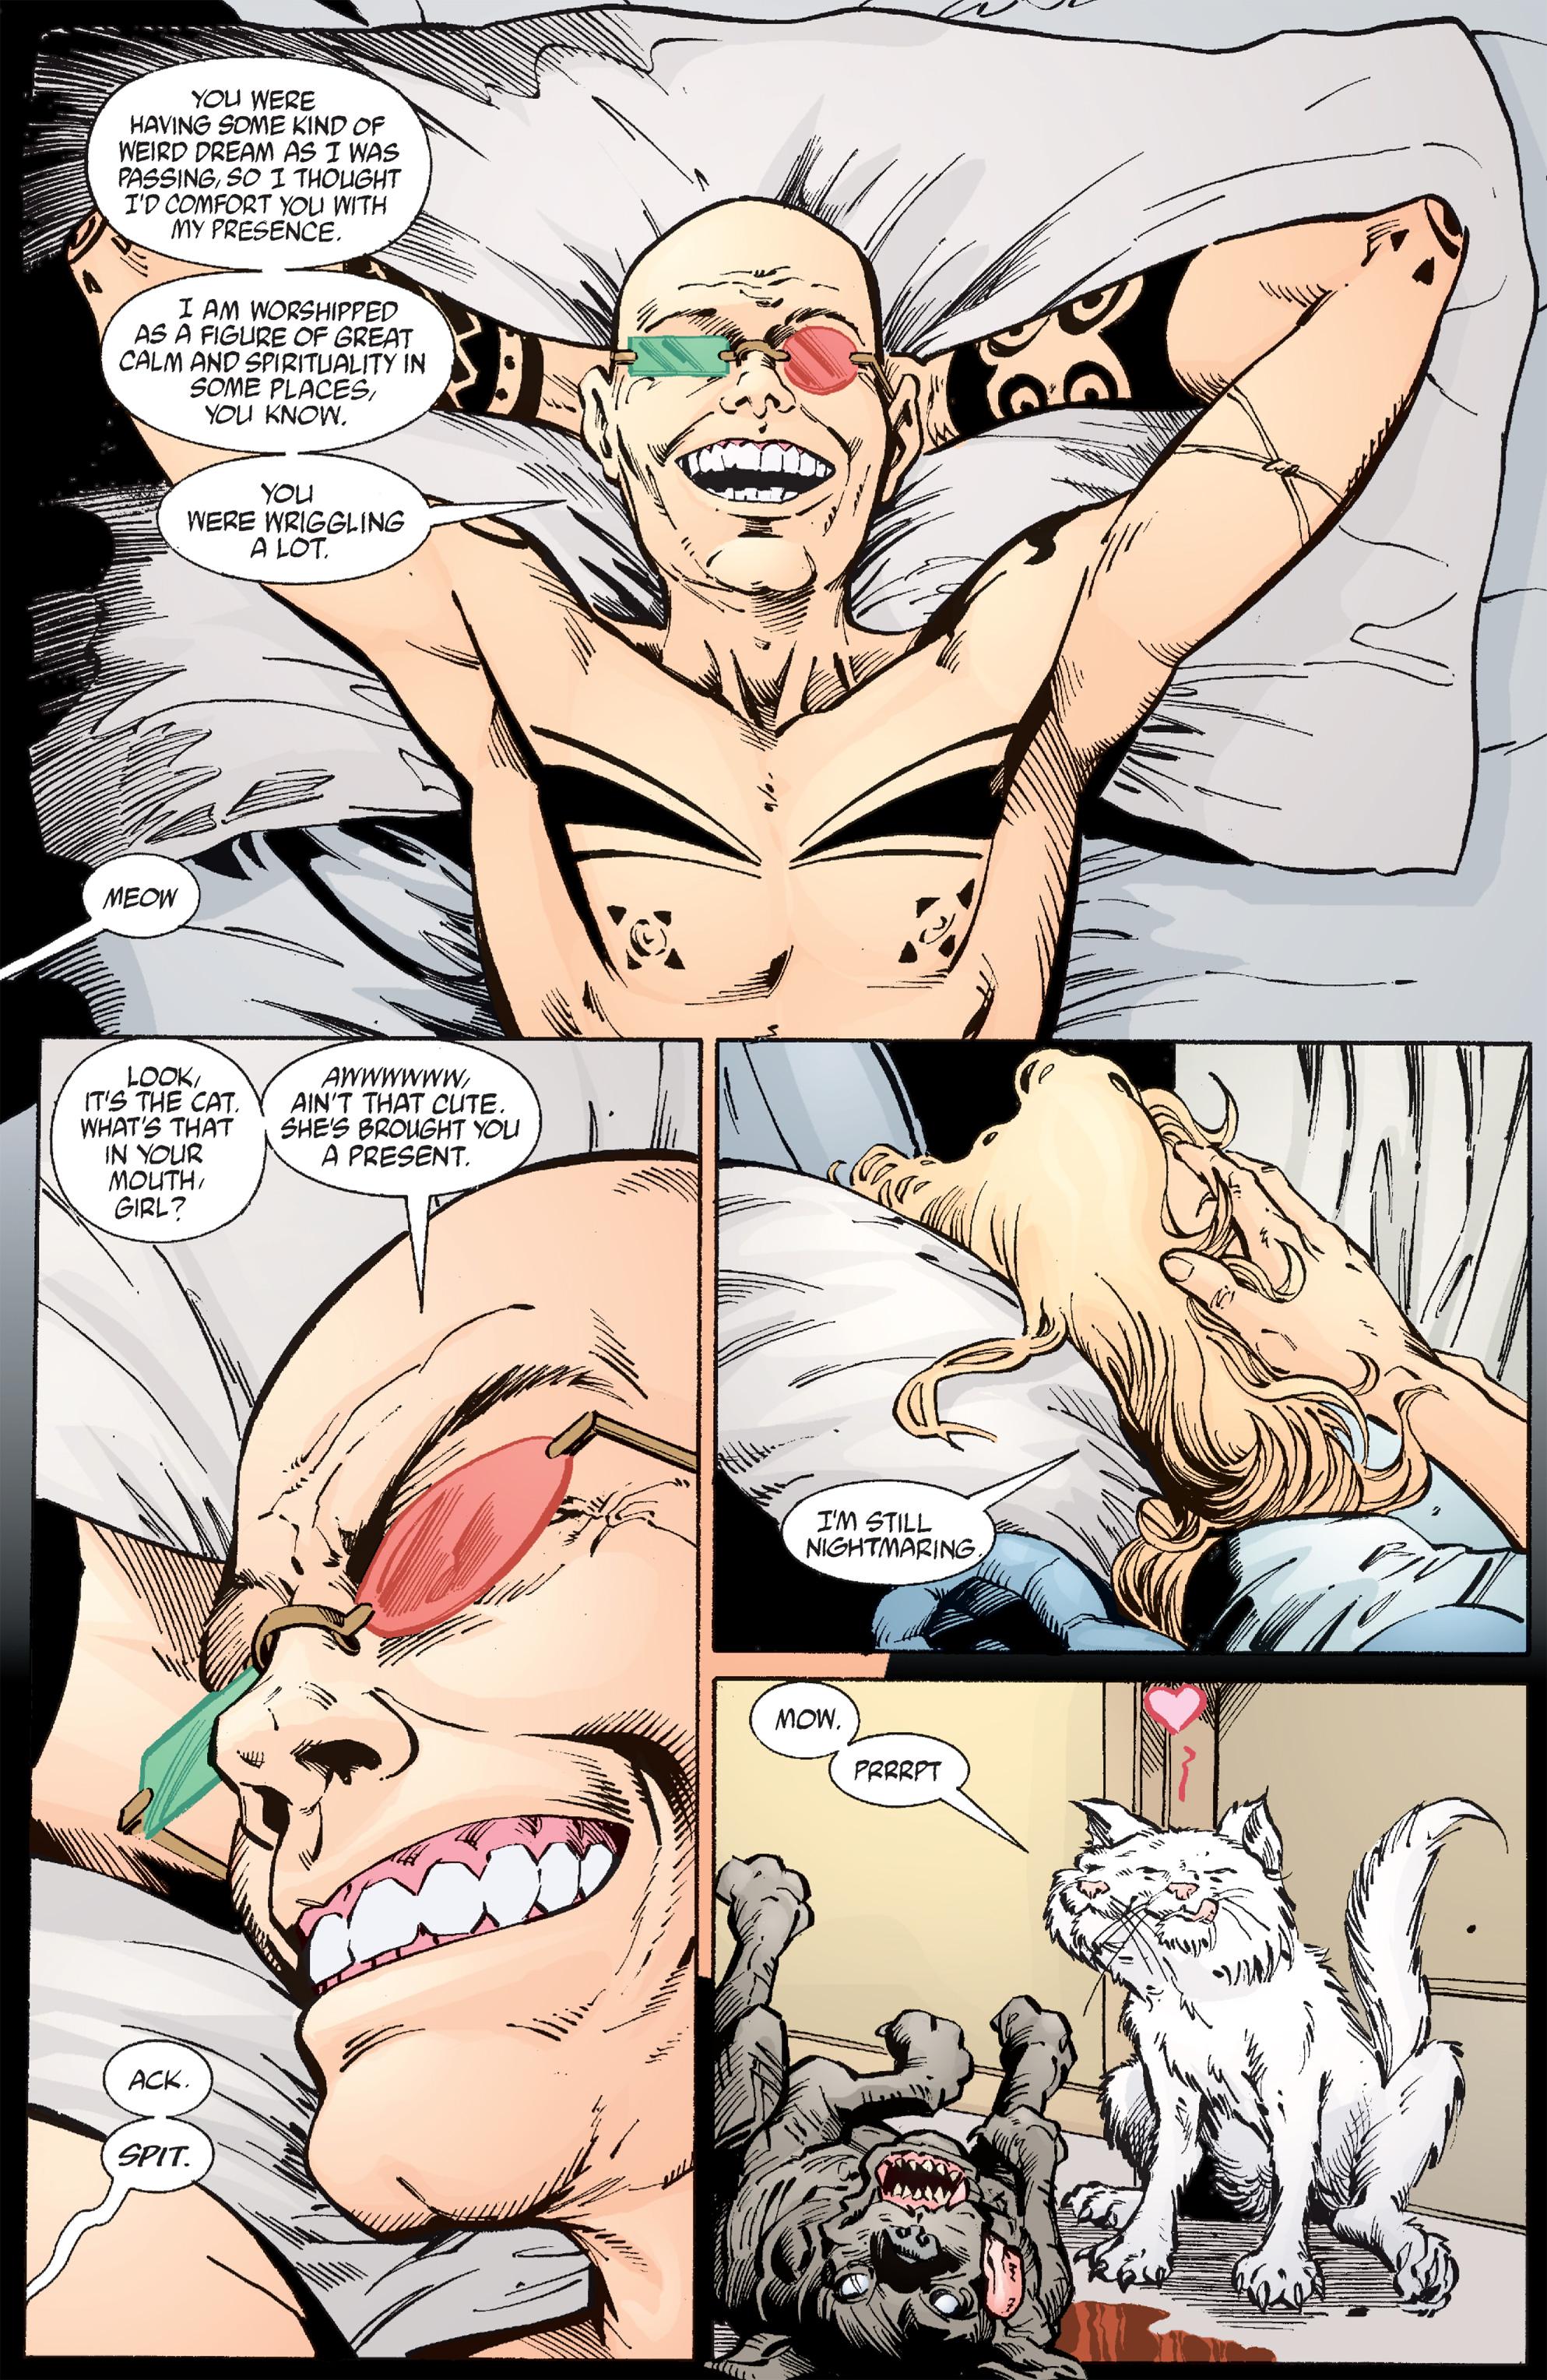 Read online Transmetropolitan comic -  Issue #49 - 5